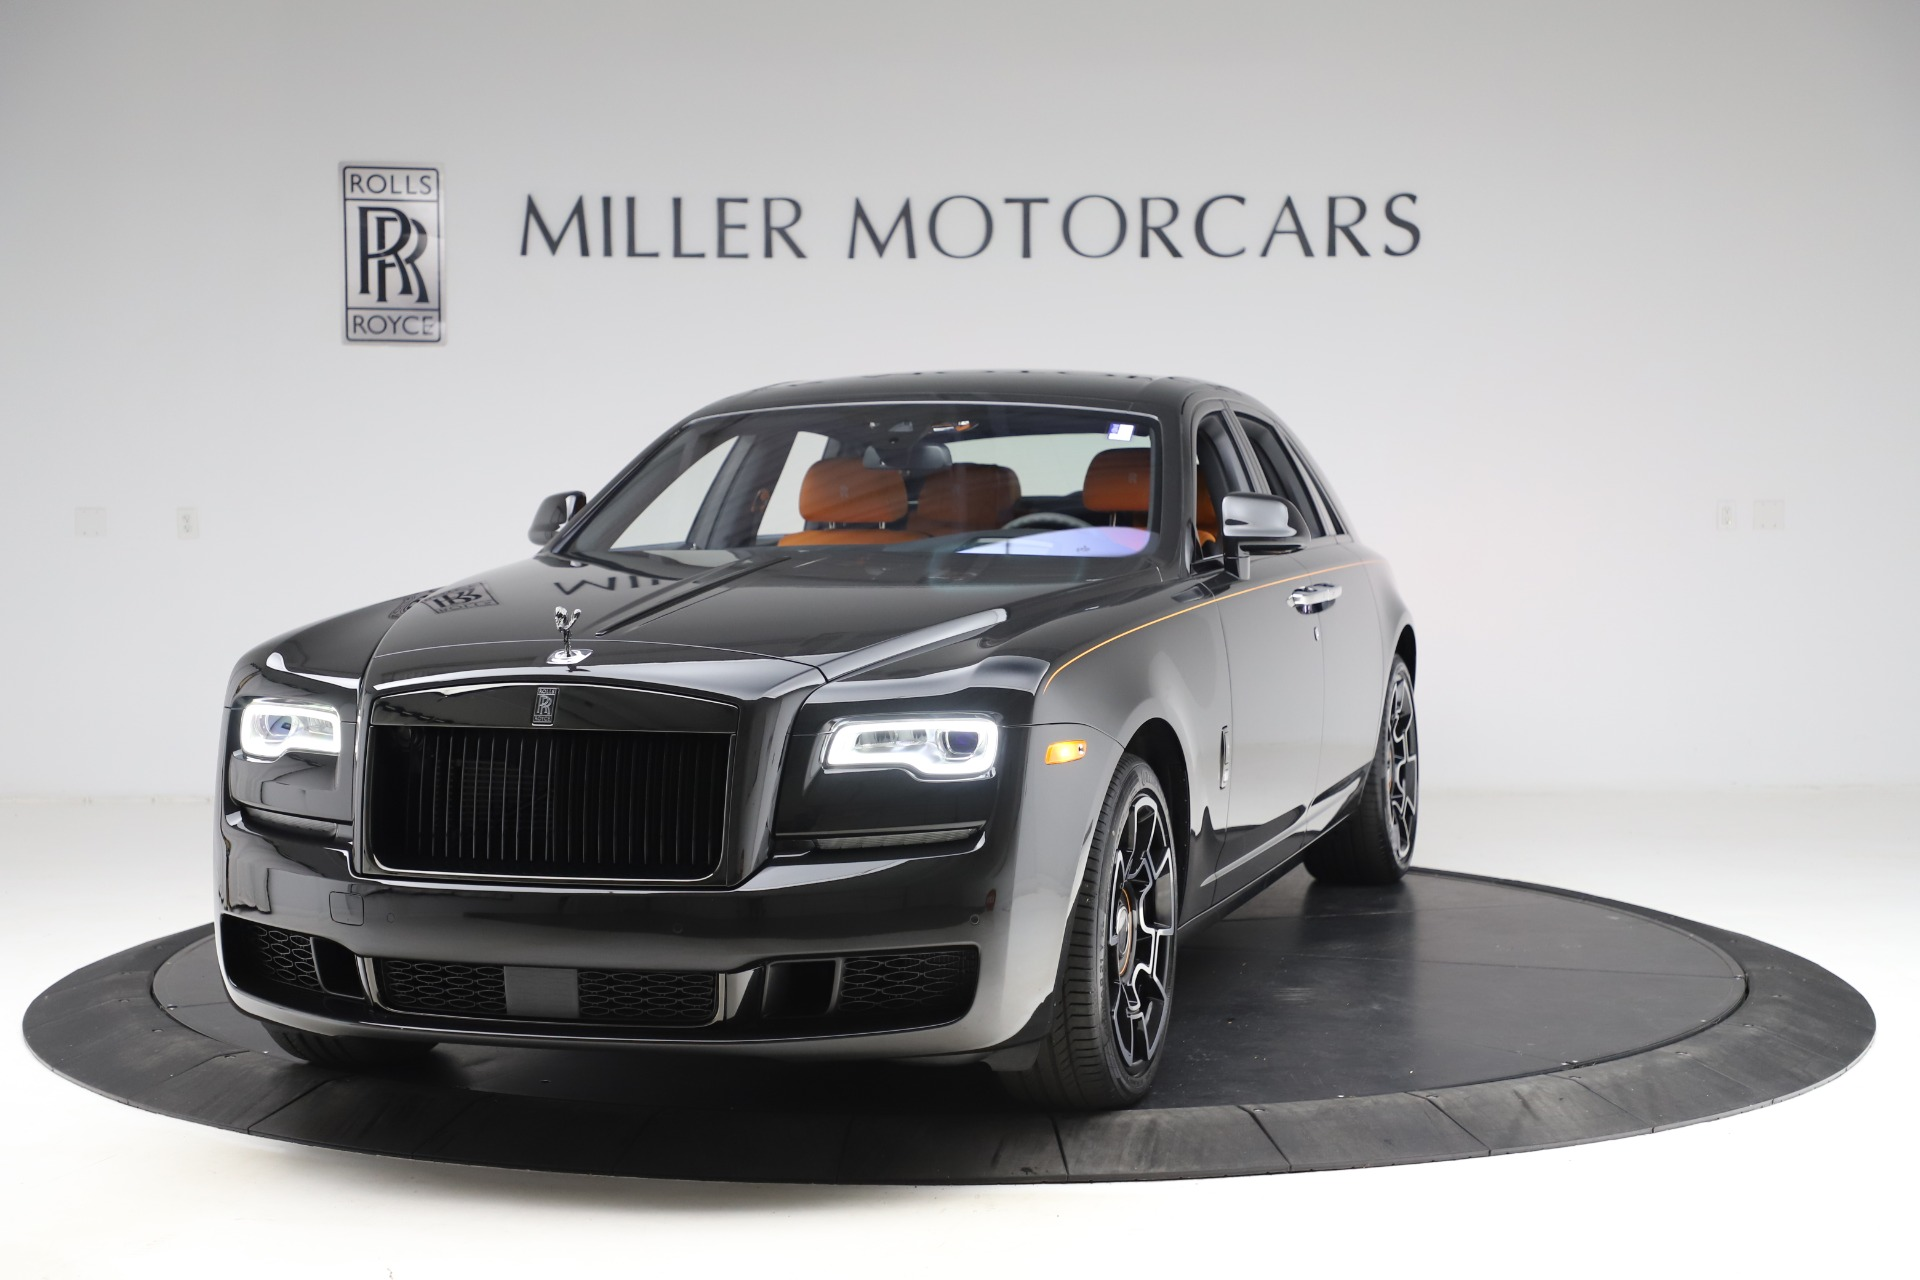 For sale : 2020 Rolls-Royce Ghost - Miller Motorcars ...